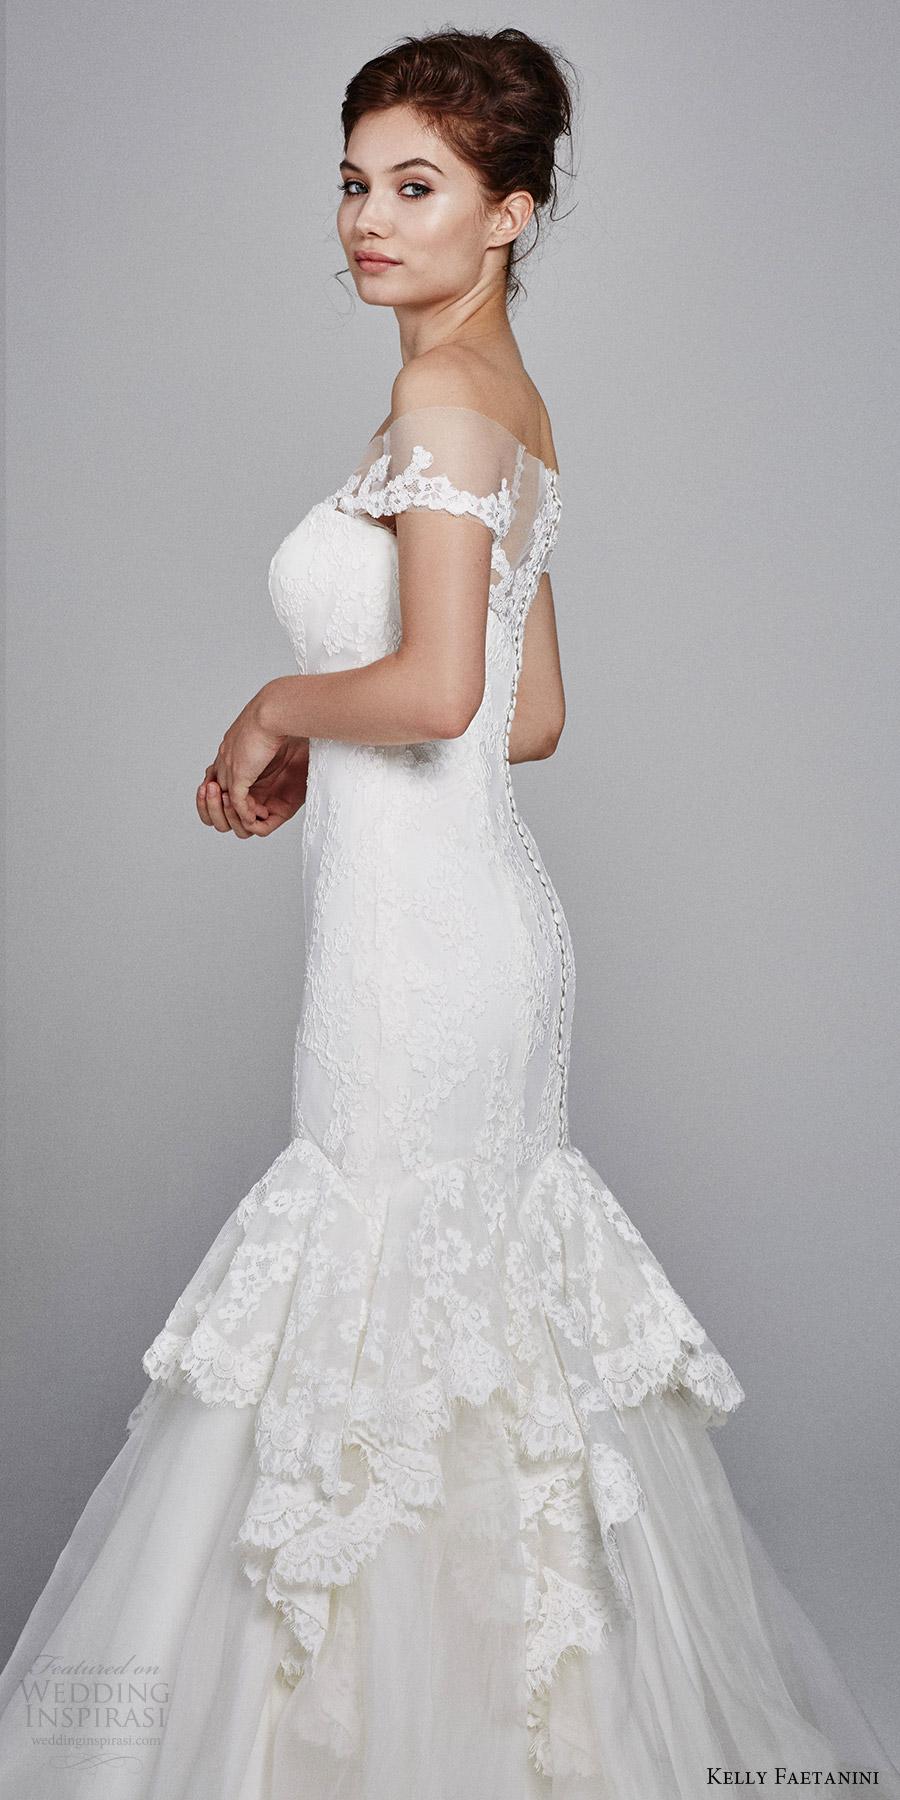 Mermaid Sweetheart Lace Wedding Dress 23 Superb kelly faetanini bridal fall